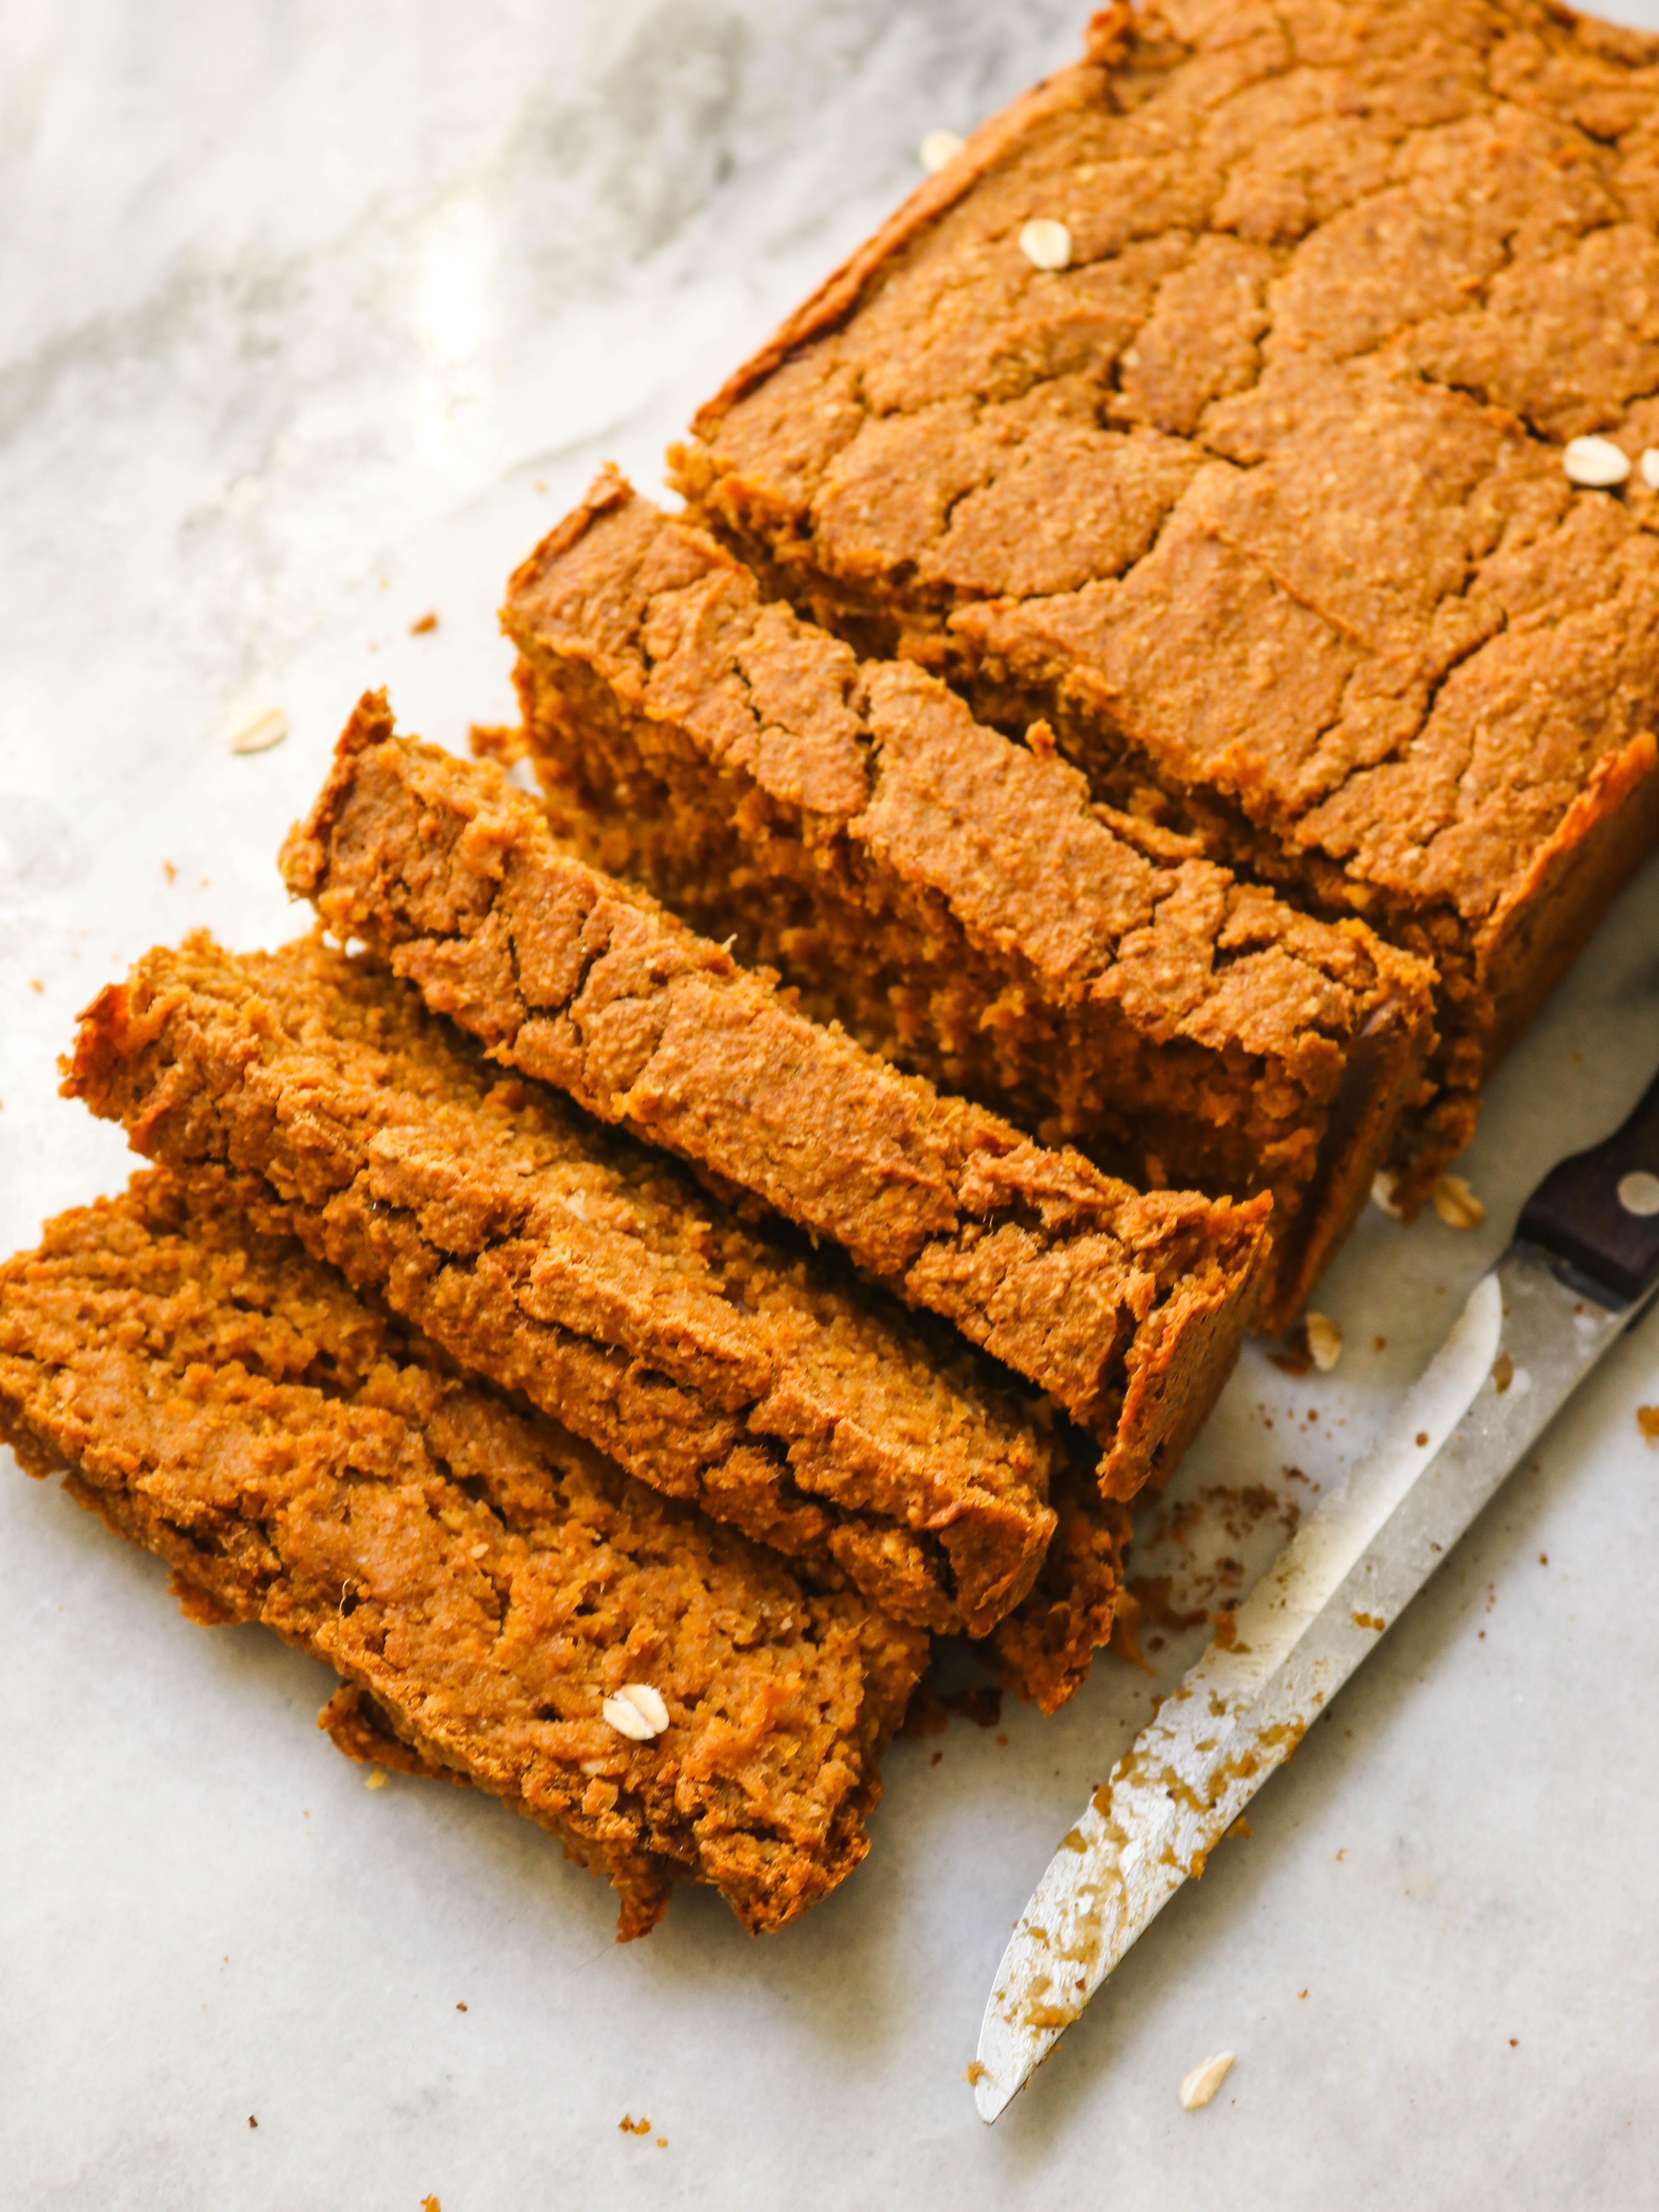 Vegan Sweet Bread Recipe  Sweet Potato Bread Vegan & Gluten Free From My Bowl